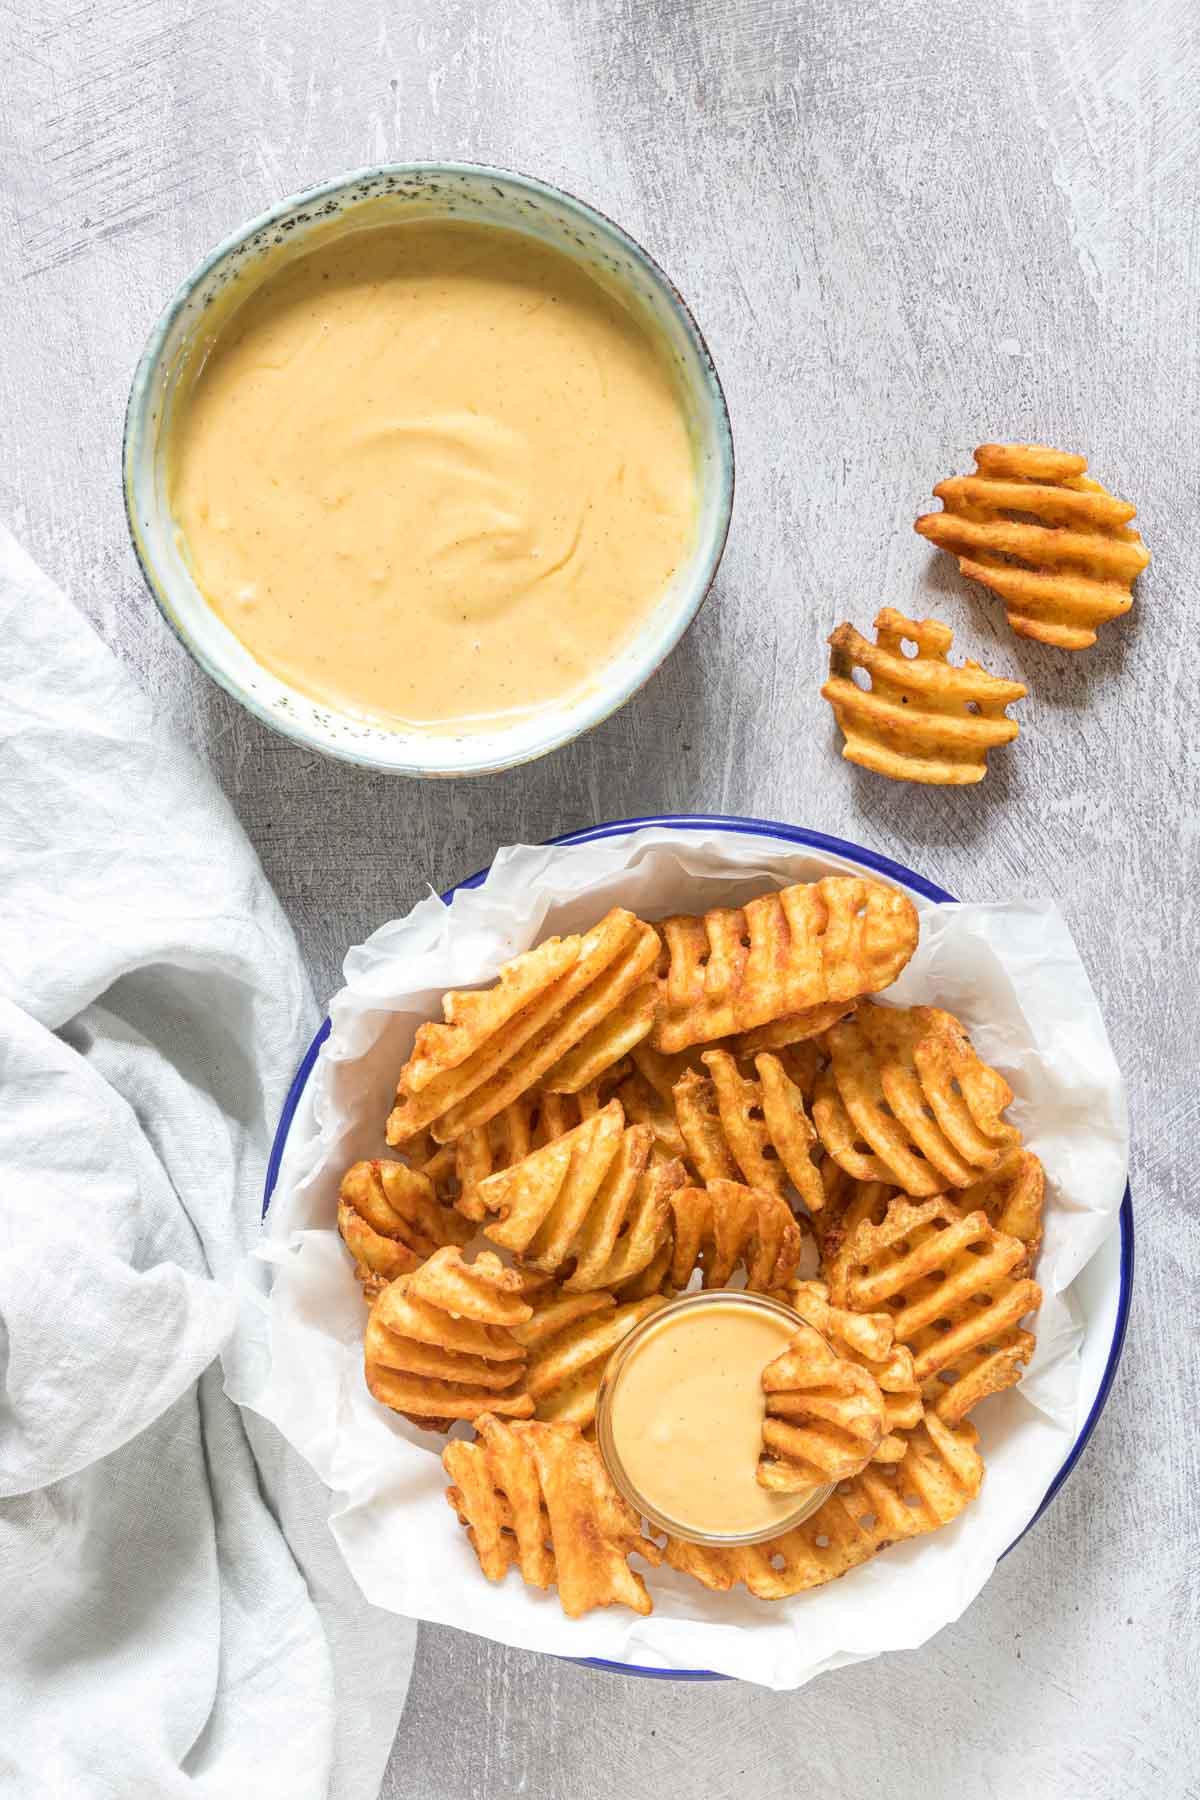 a plate of waffles fries served alongside a bowl of copycat chick fil a sauce